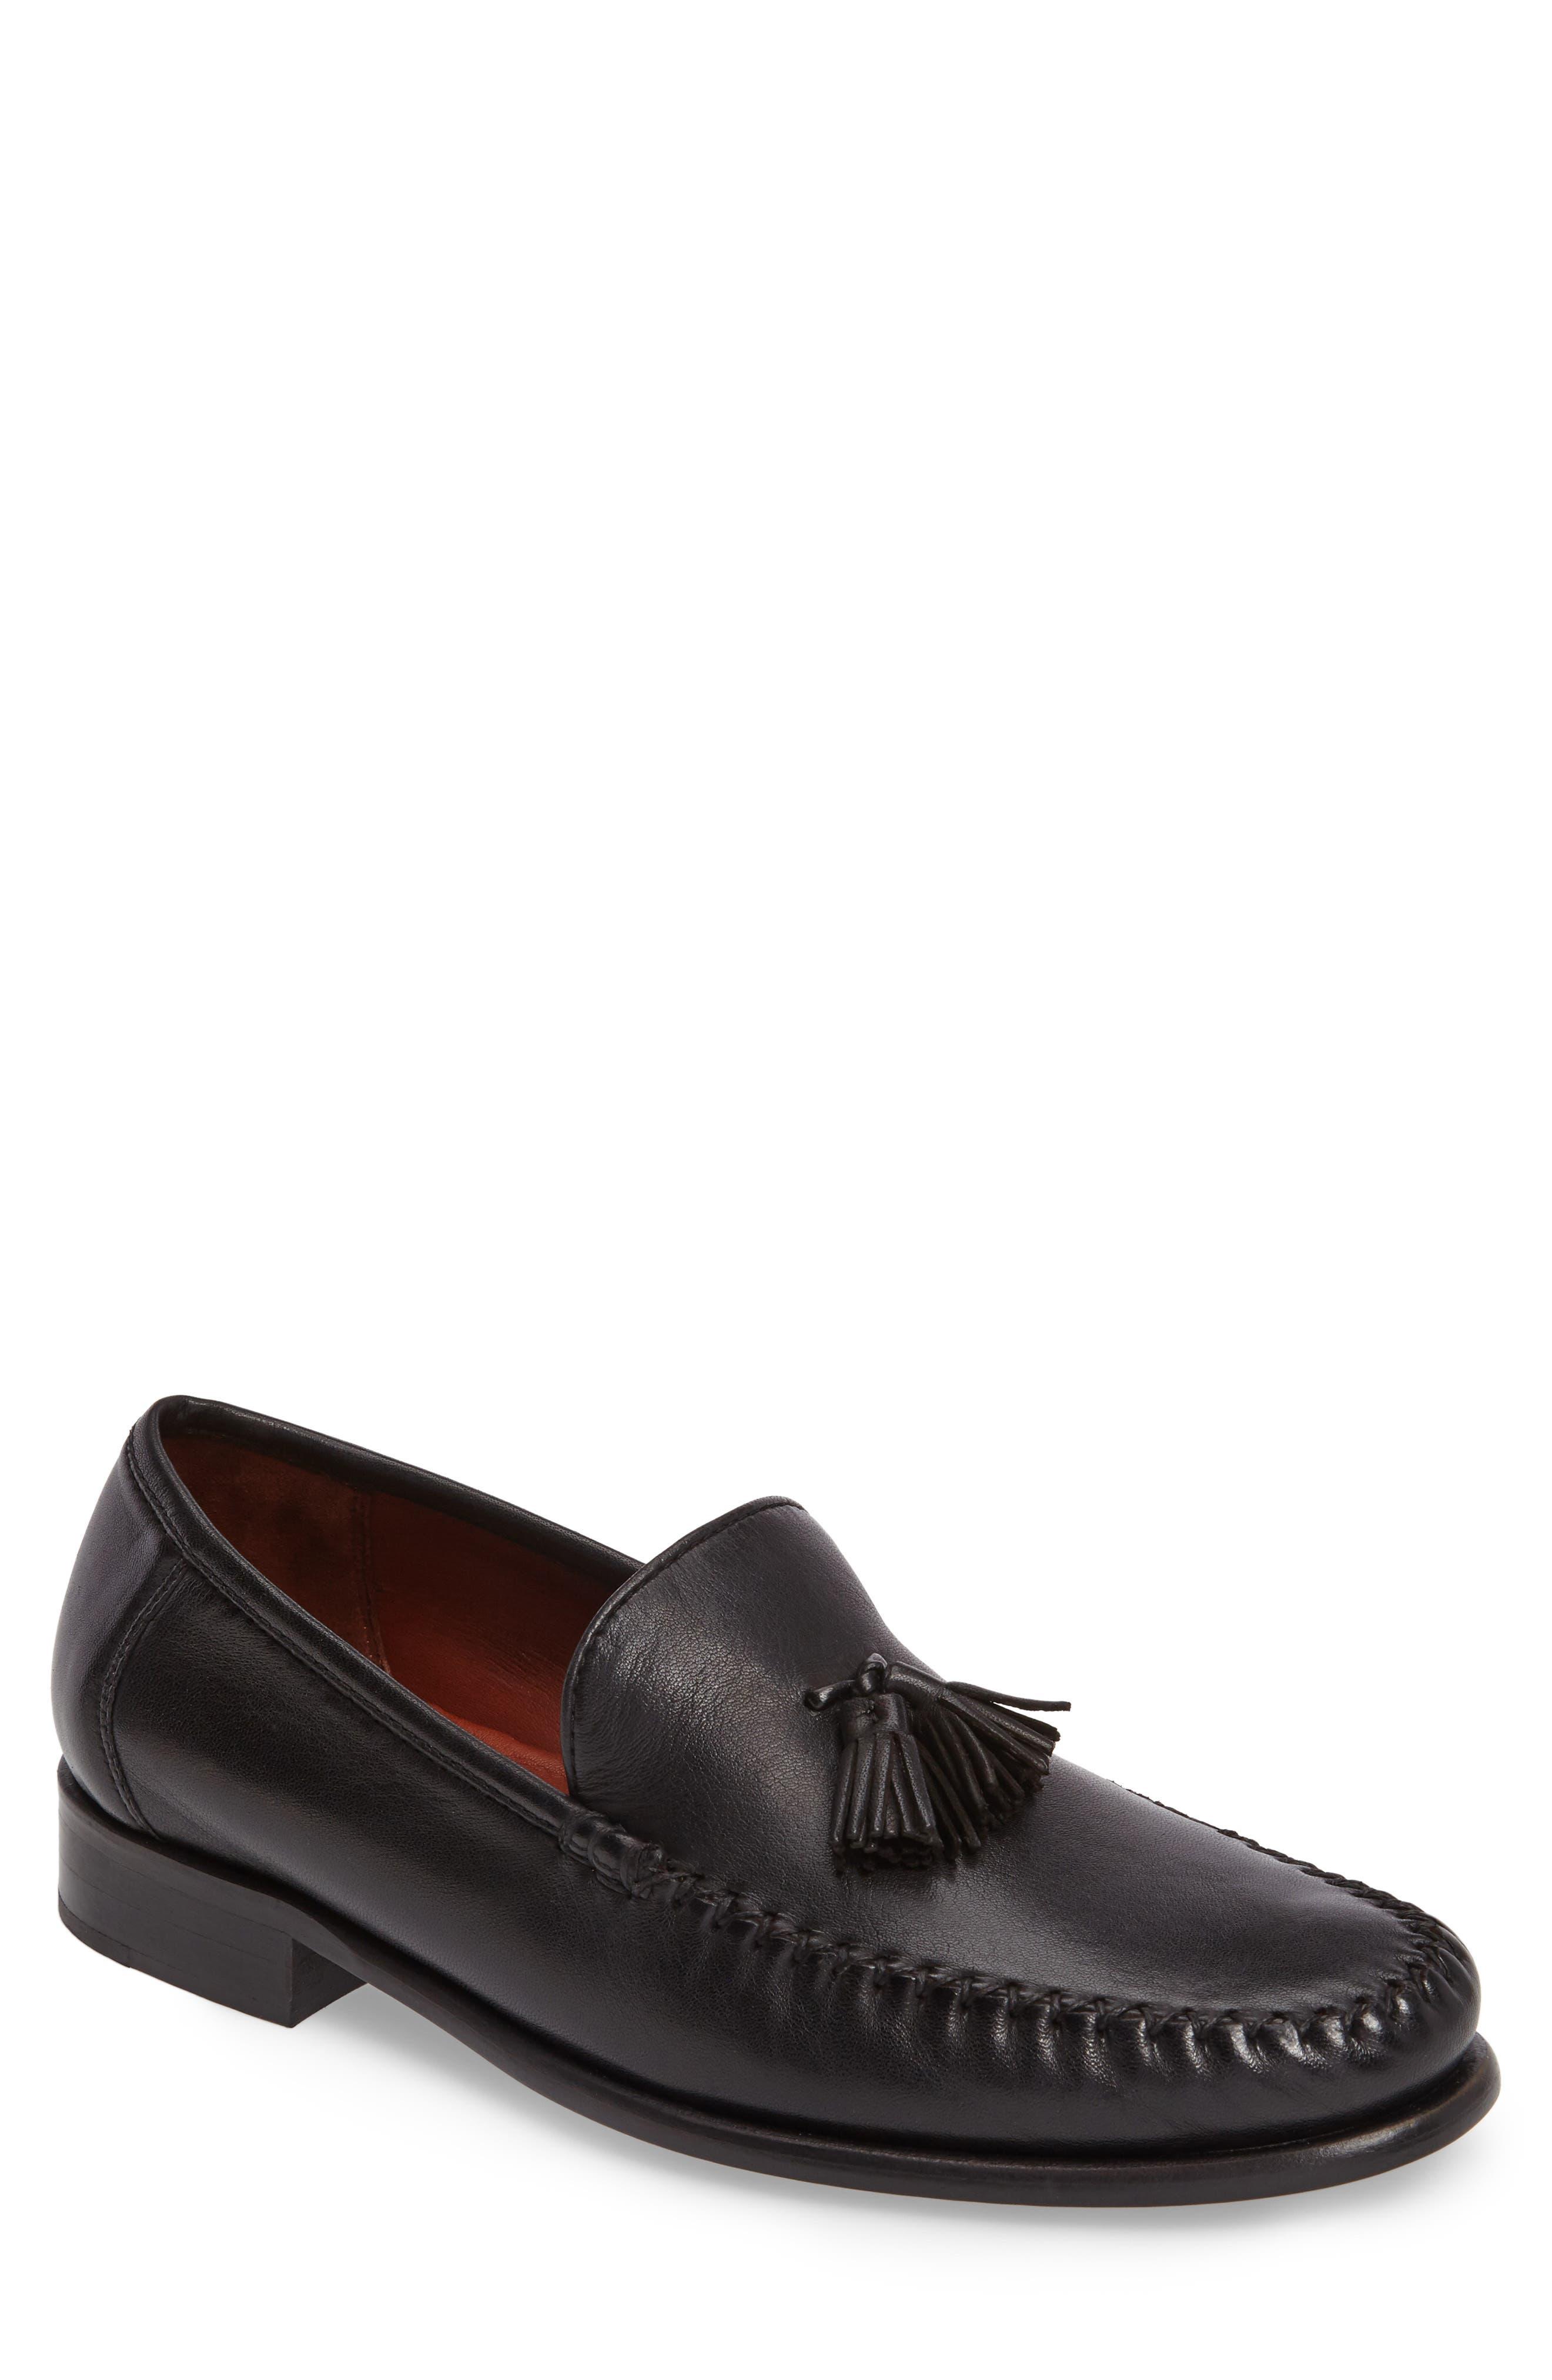 Buy Brand Shoes Robert Zur Men s Elon Tassel Loafers Men Black